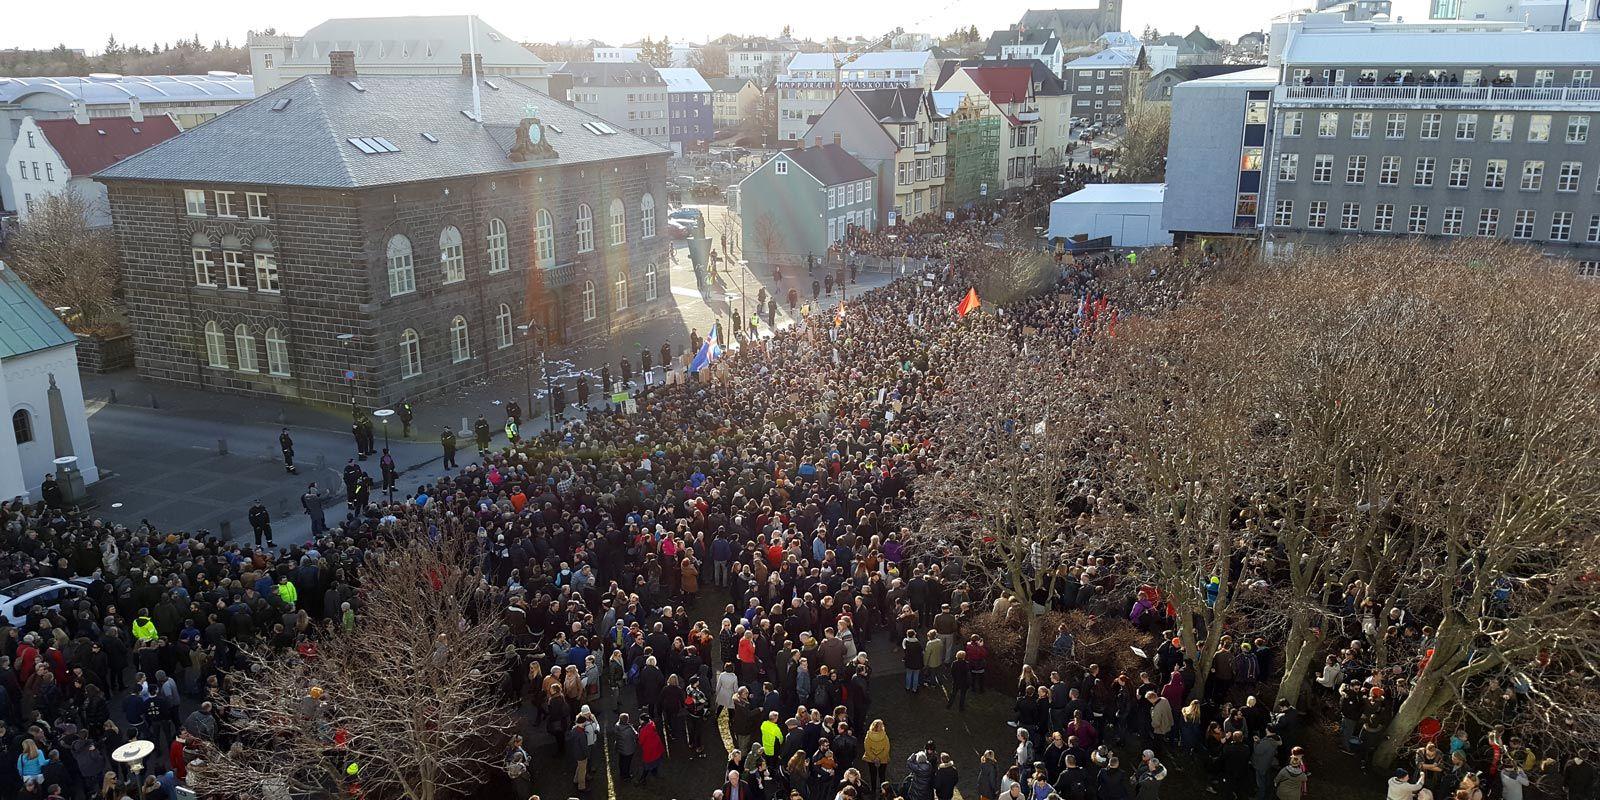 Protesters outside Iceland's parliament in Reykjavik on Monday. Photo: Jóhannes Kr. Kristjánsson / Reykjavik Media